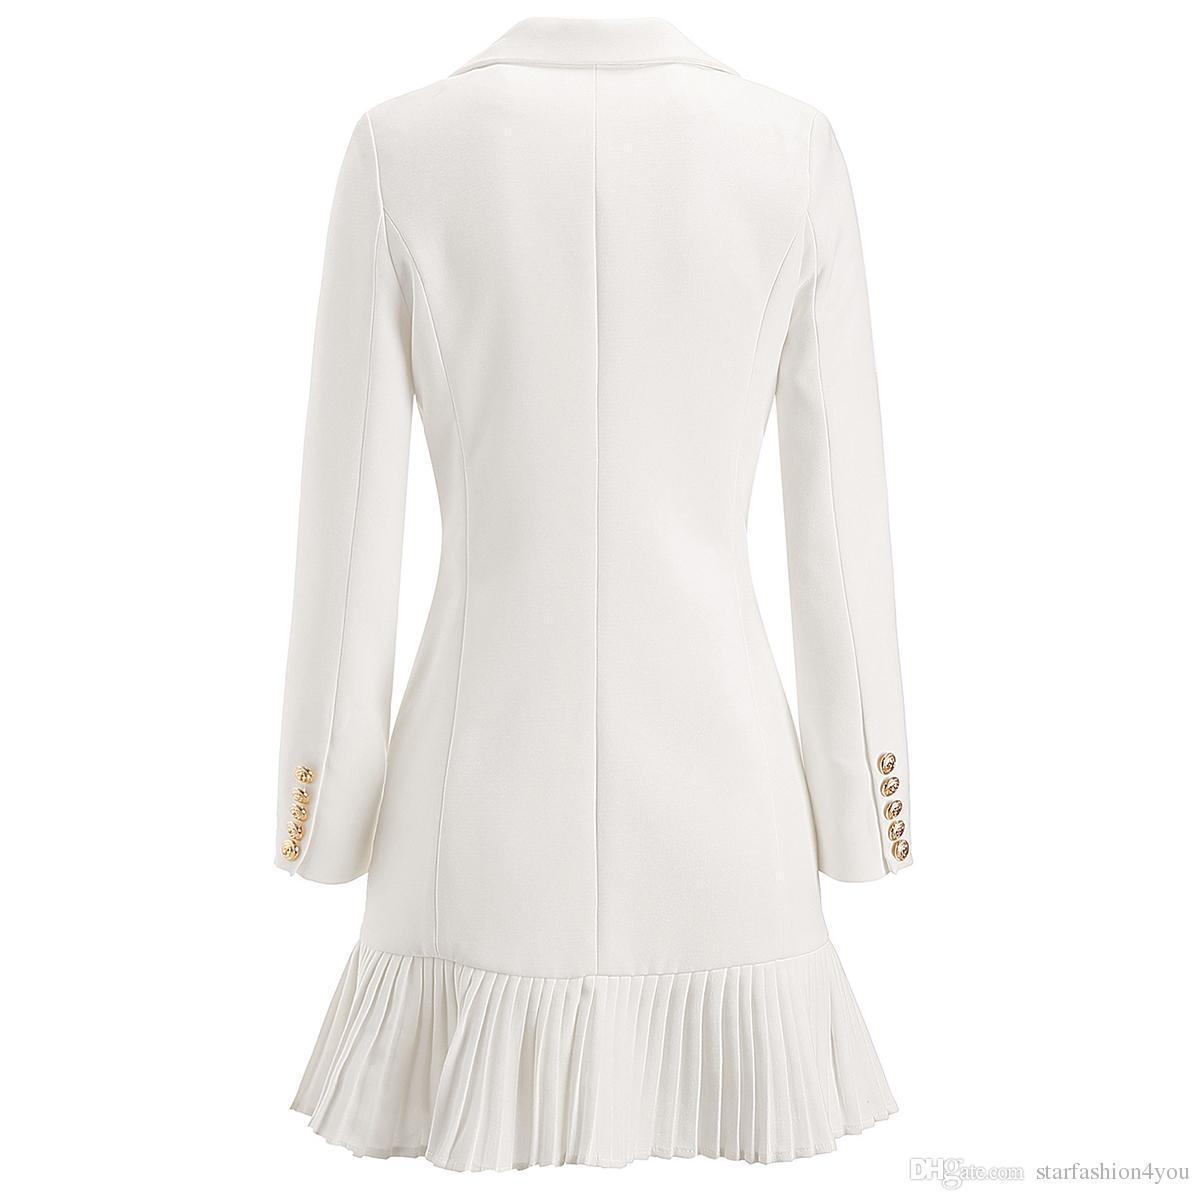 sexy night women's ladies females top quality Bal brand metal buckles tassels dress skirts evening dress S-XXXL